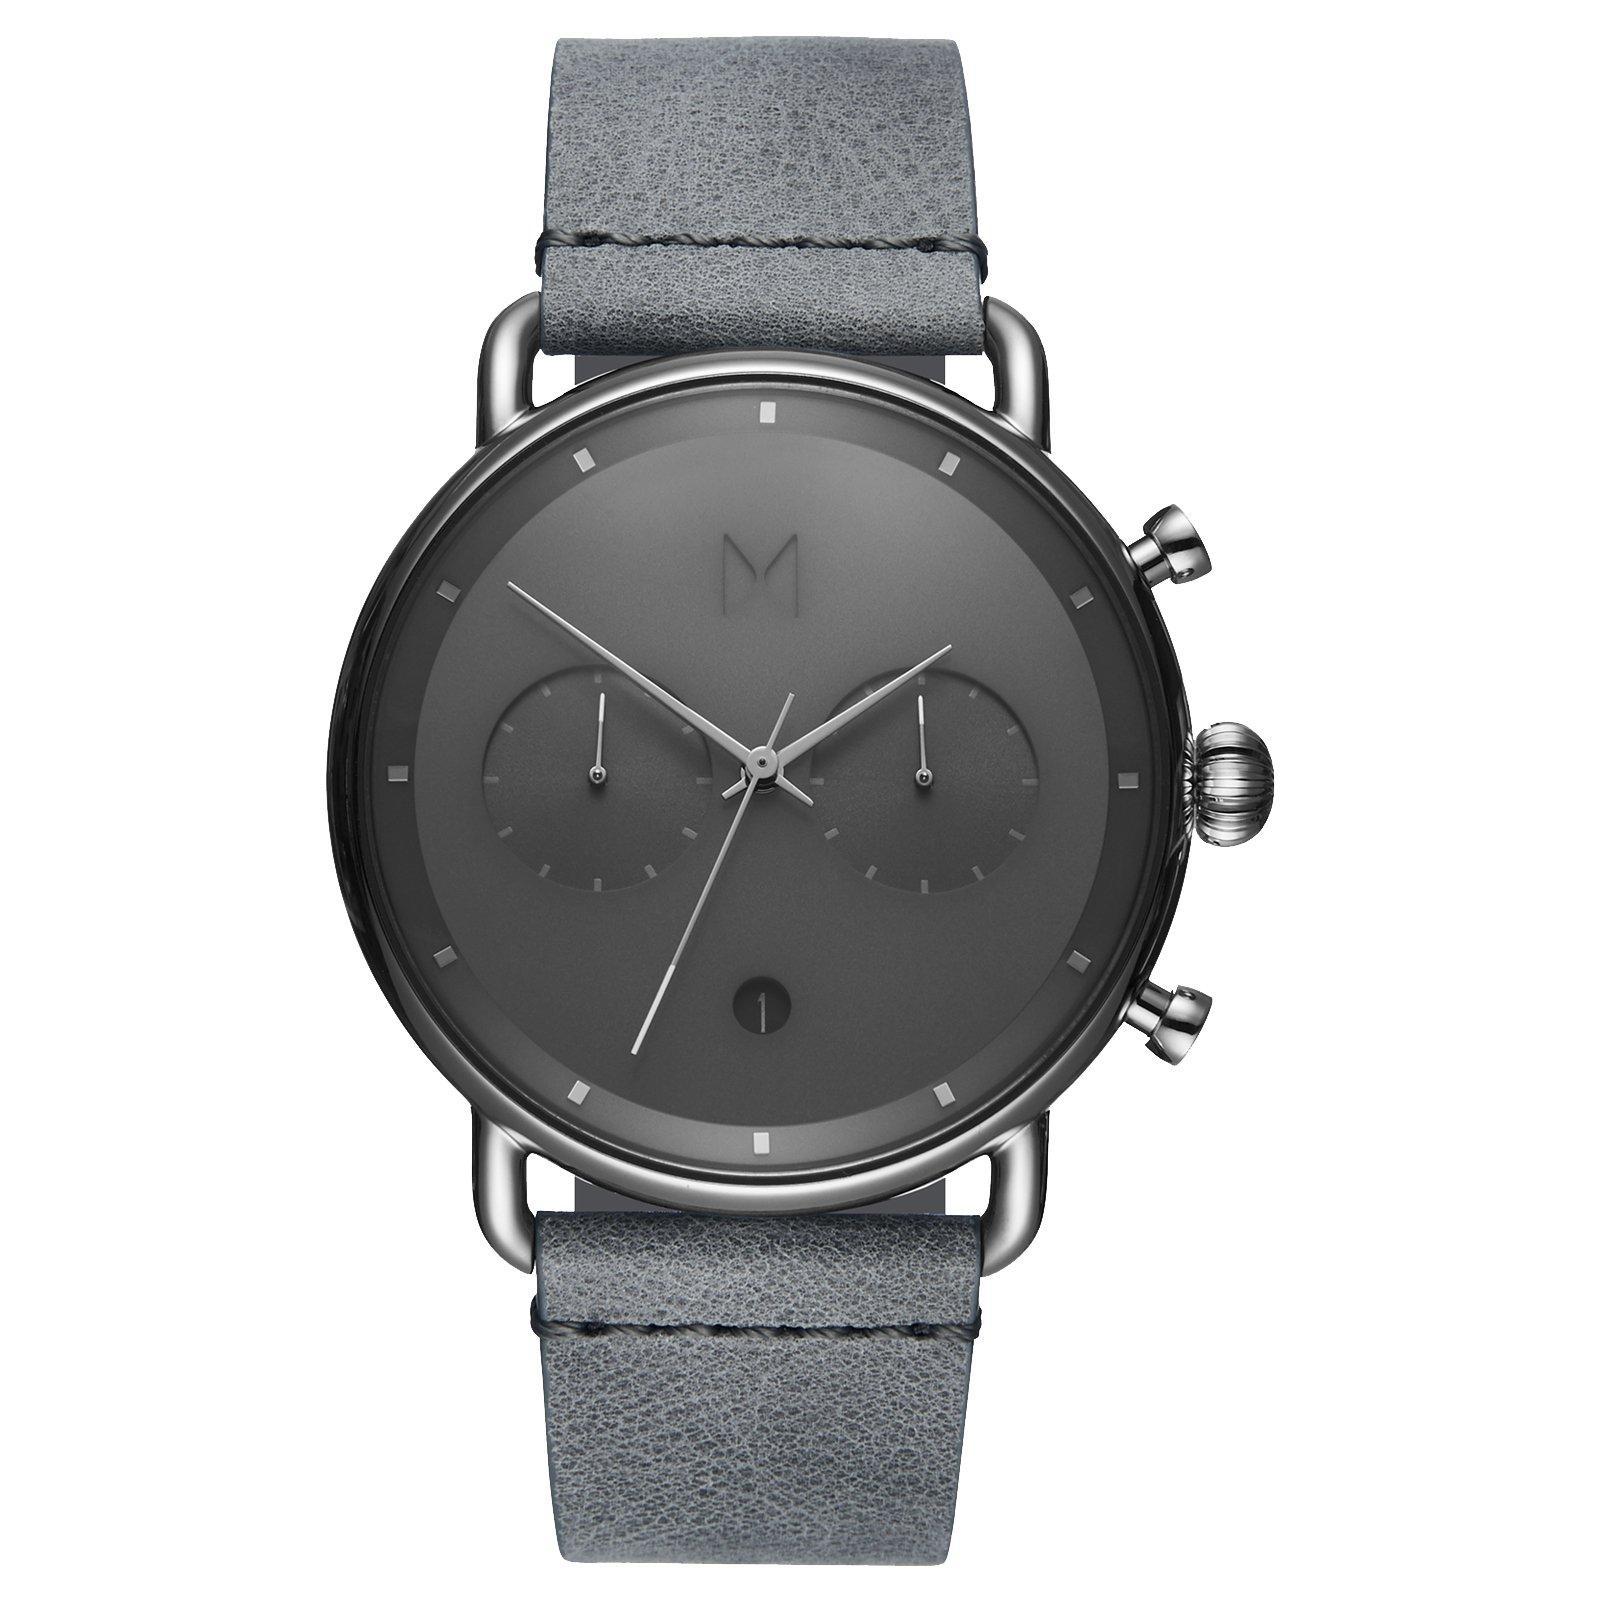 MVMT Blacktop Chronograph Men's Watch